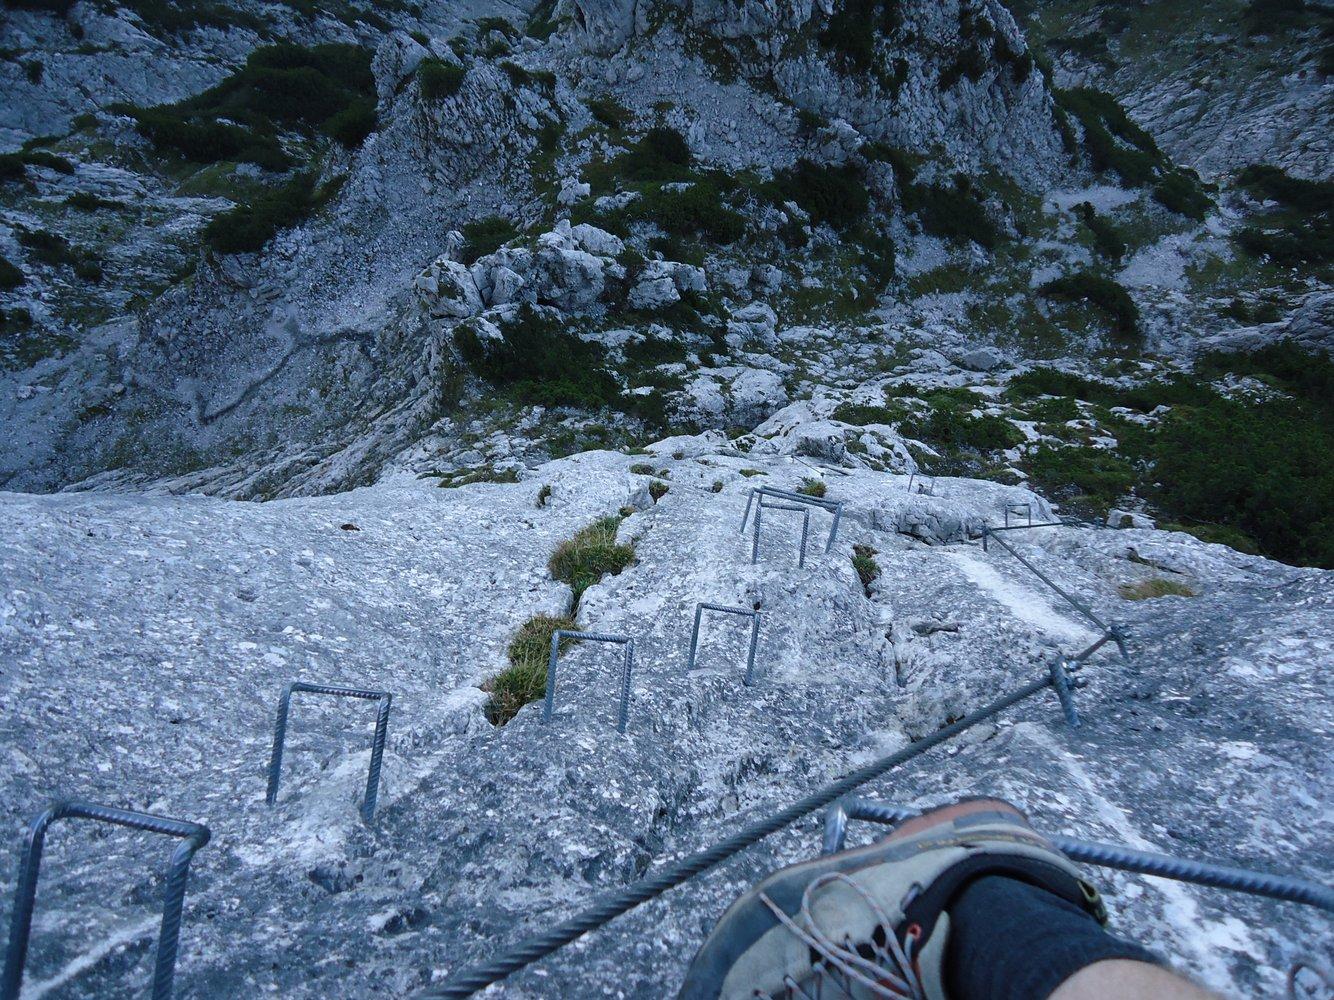 Pidinger Klettersteig : Pidinger klettersteig bergsteigen